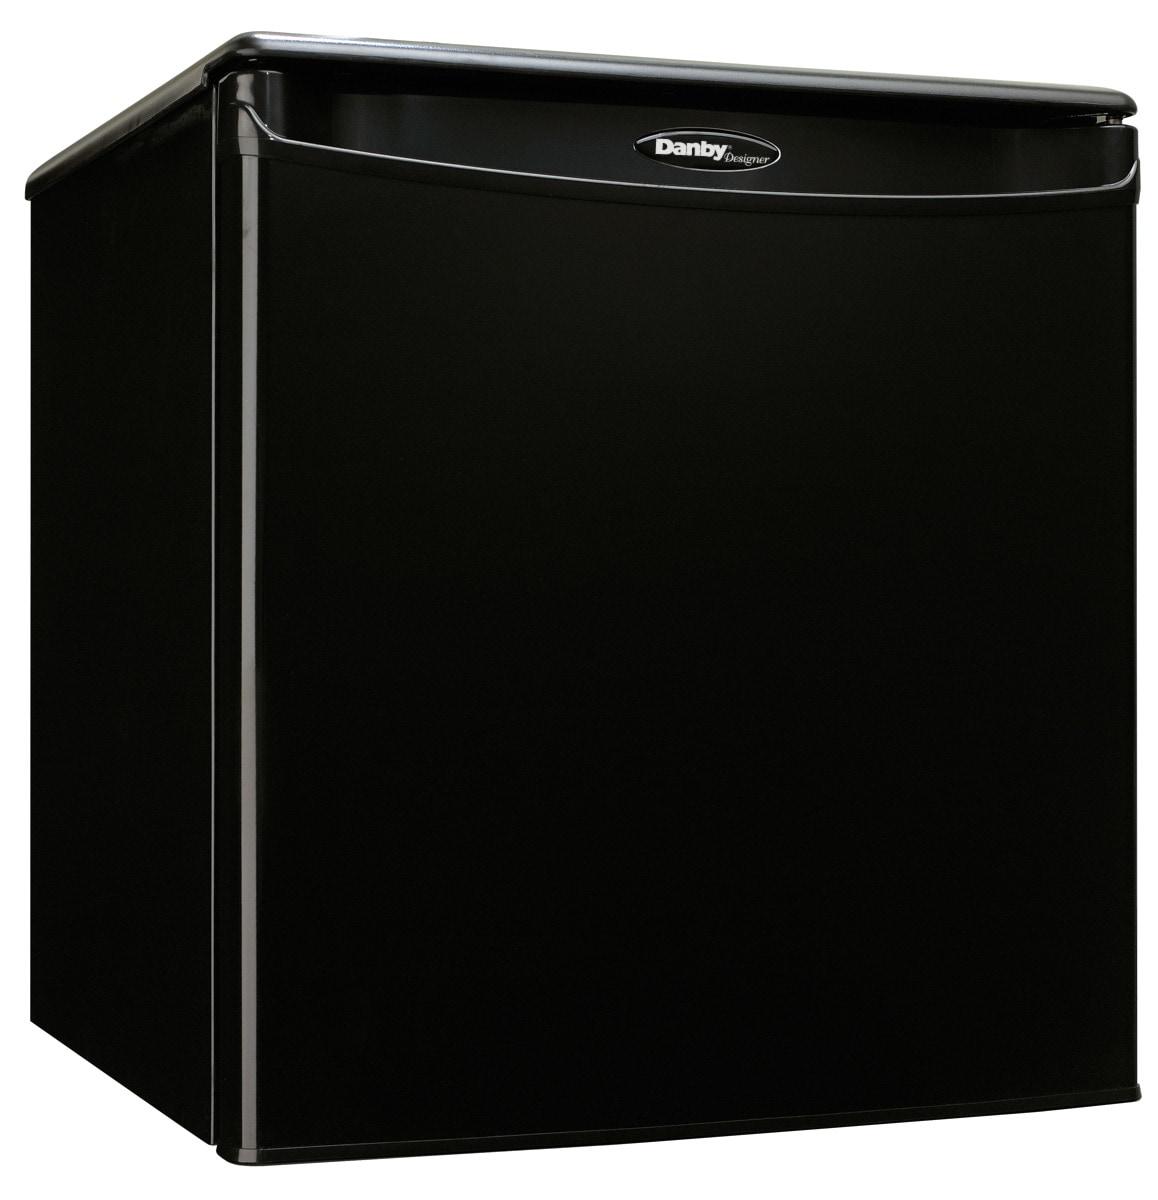 Danby Black Compact Refrigerator (1.7 Cu. Ft.) - DAR017A2BDD